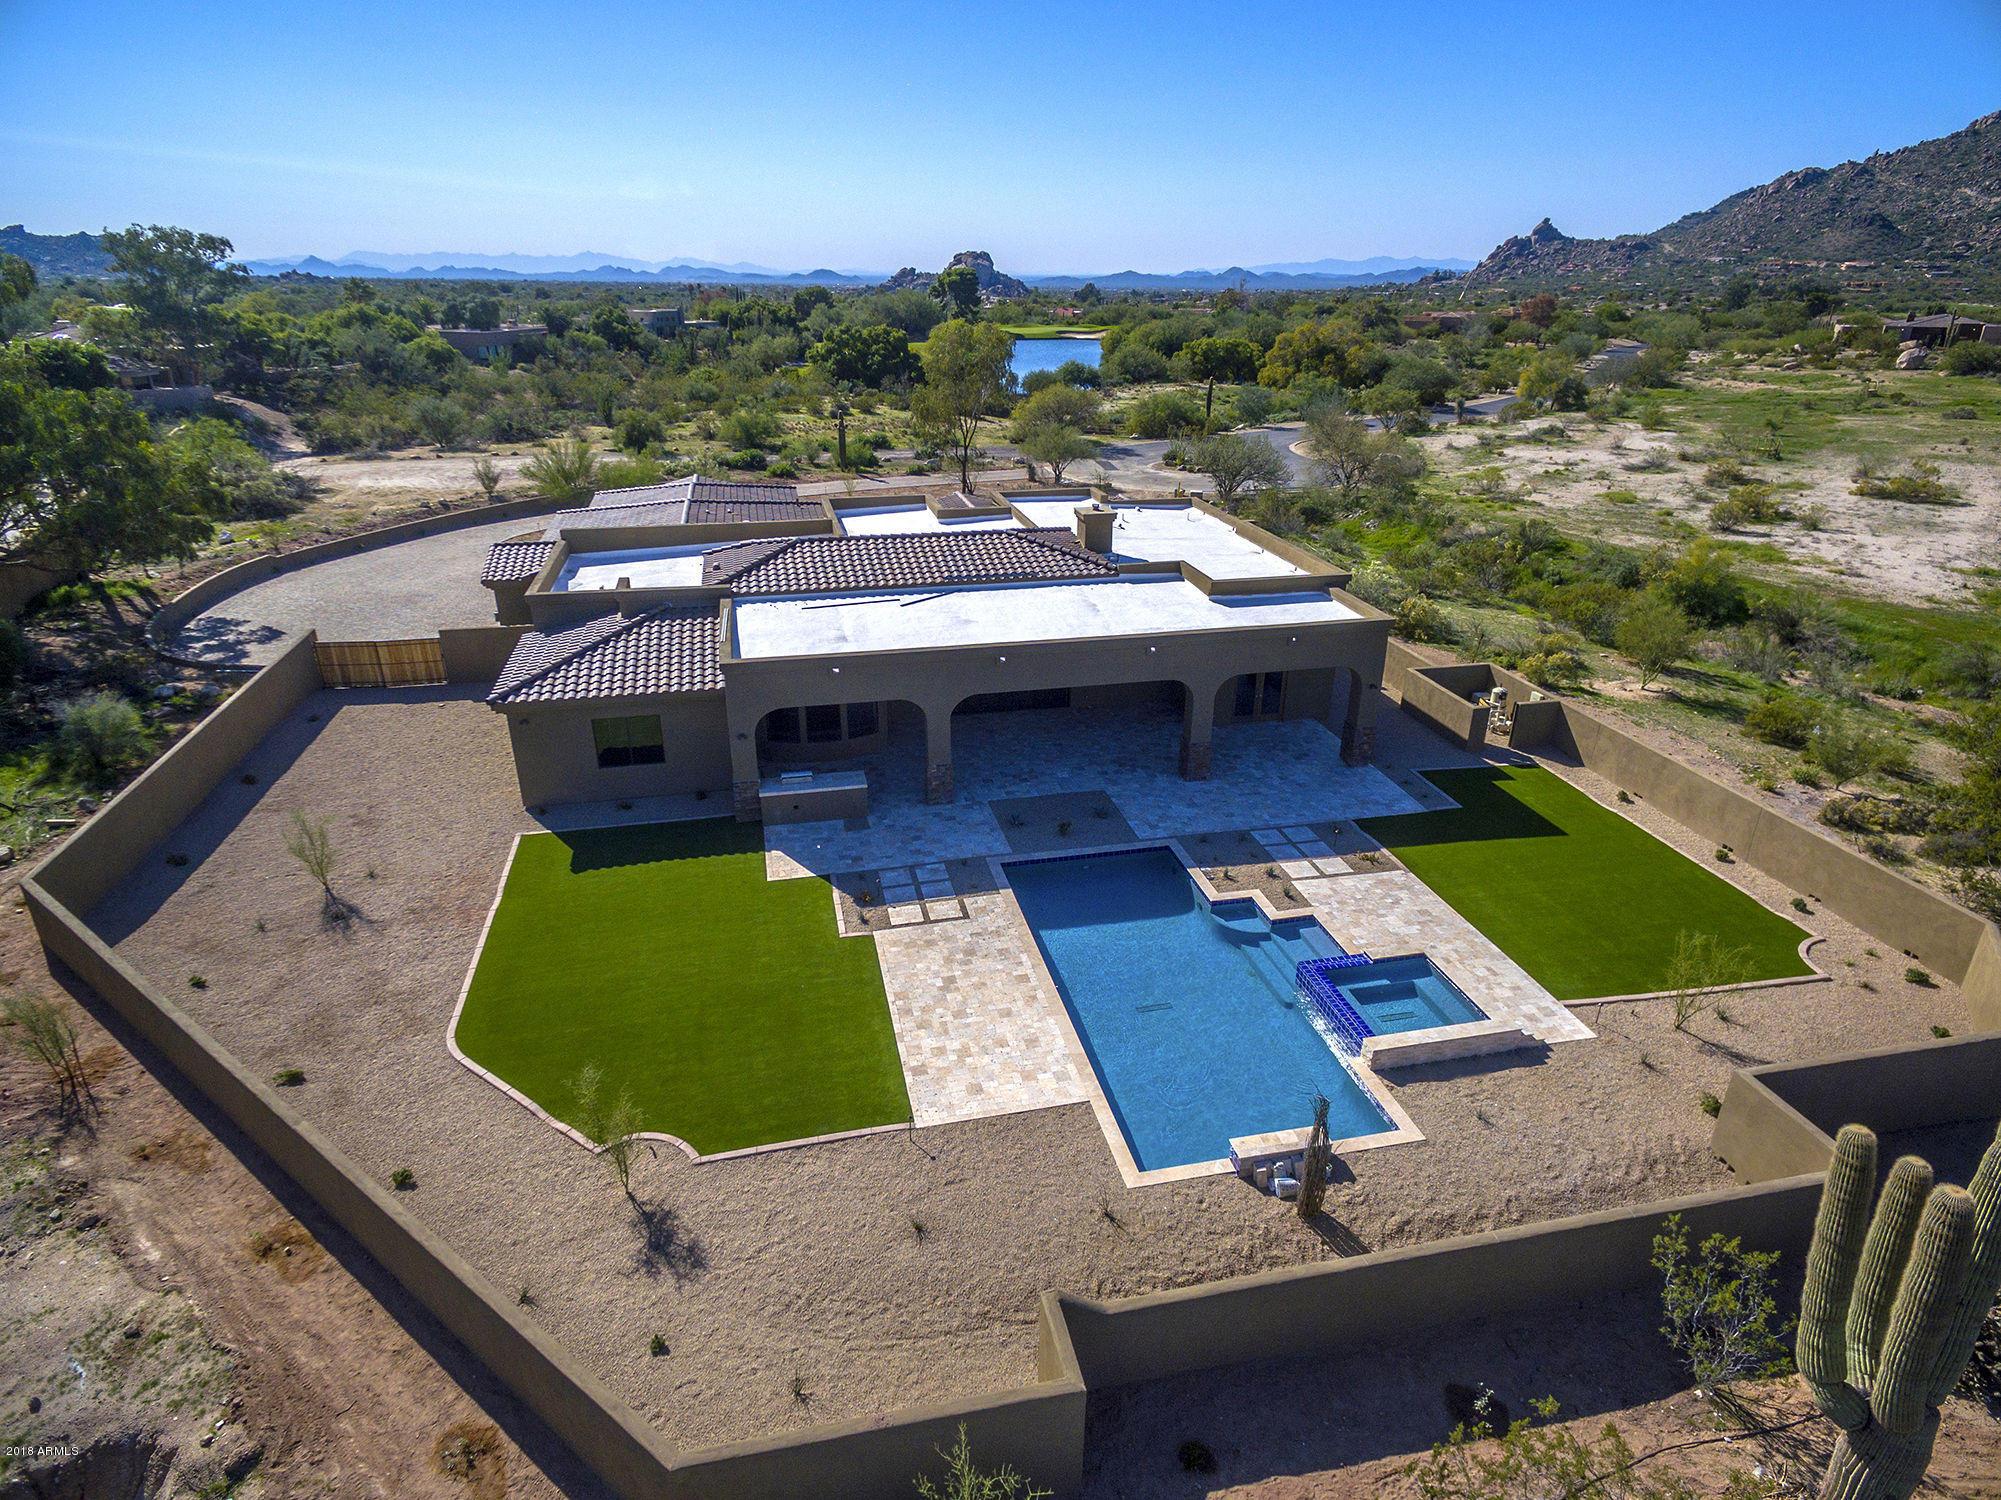 MLS 5845733 4012 La Ultima Piedra --, Carefree, AZ 85377 Carefree AZ Gated